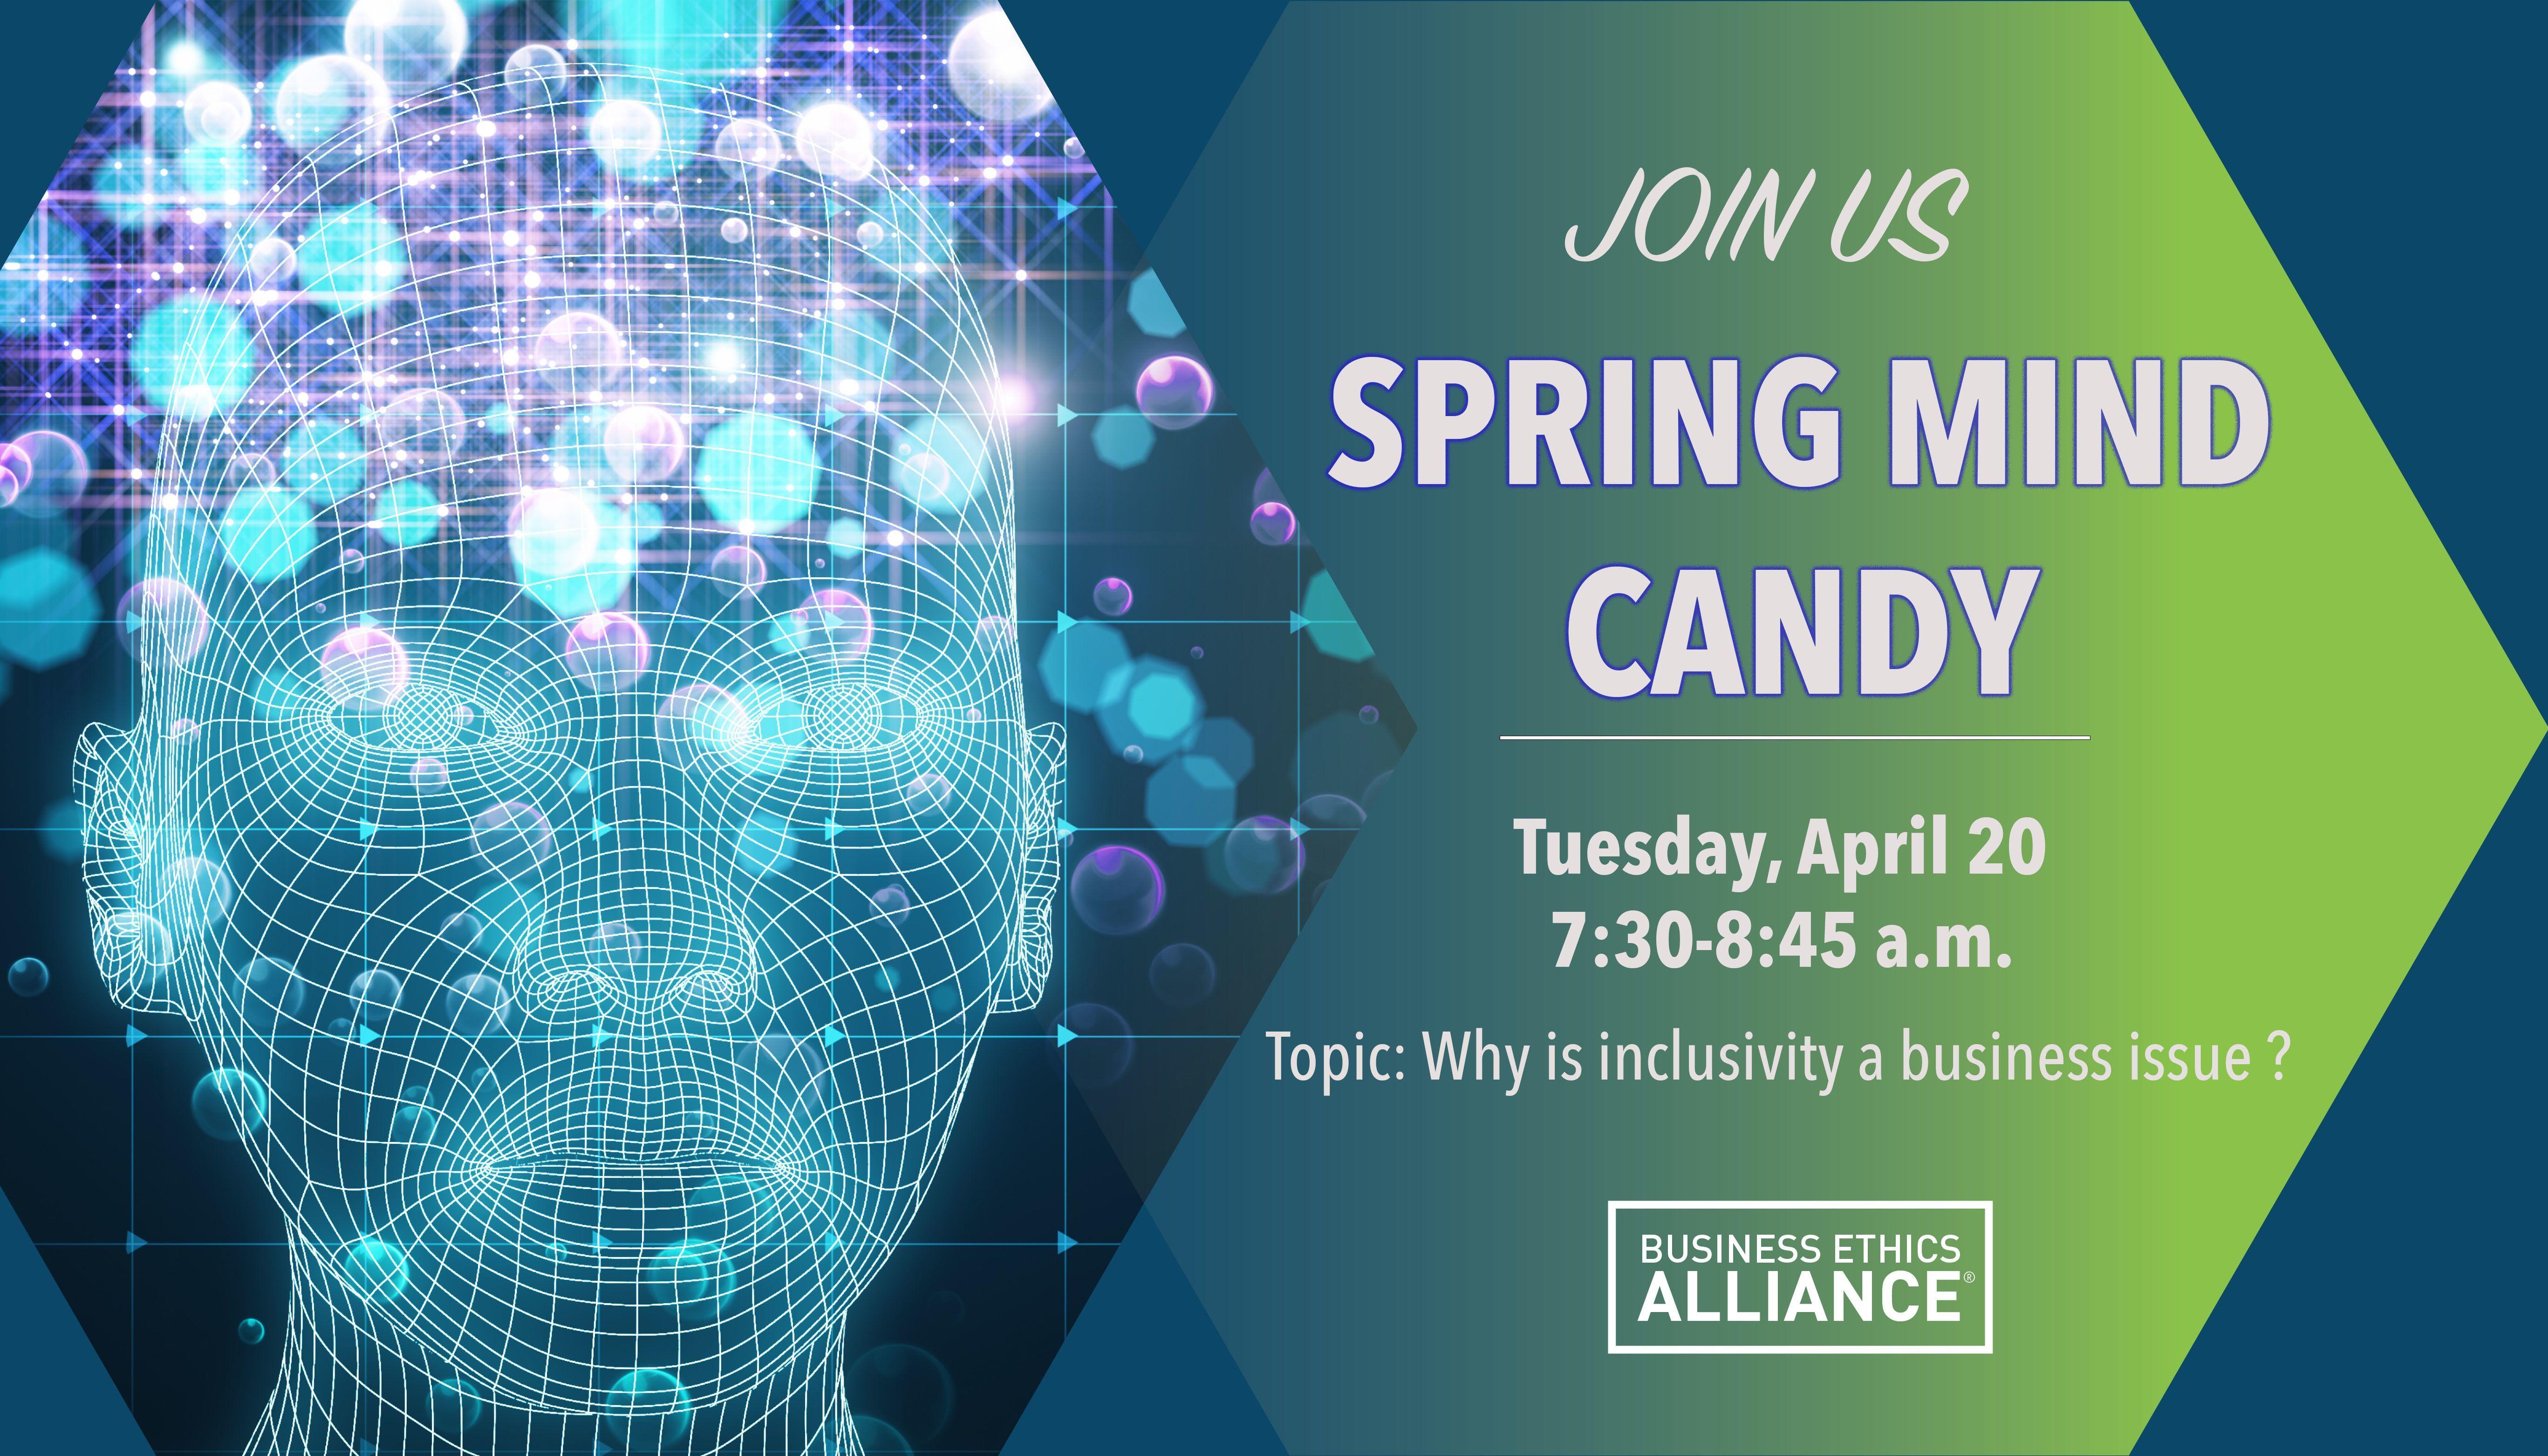 Spring Mind Candy Dialogue